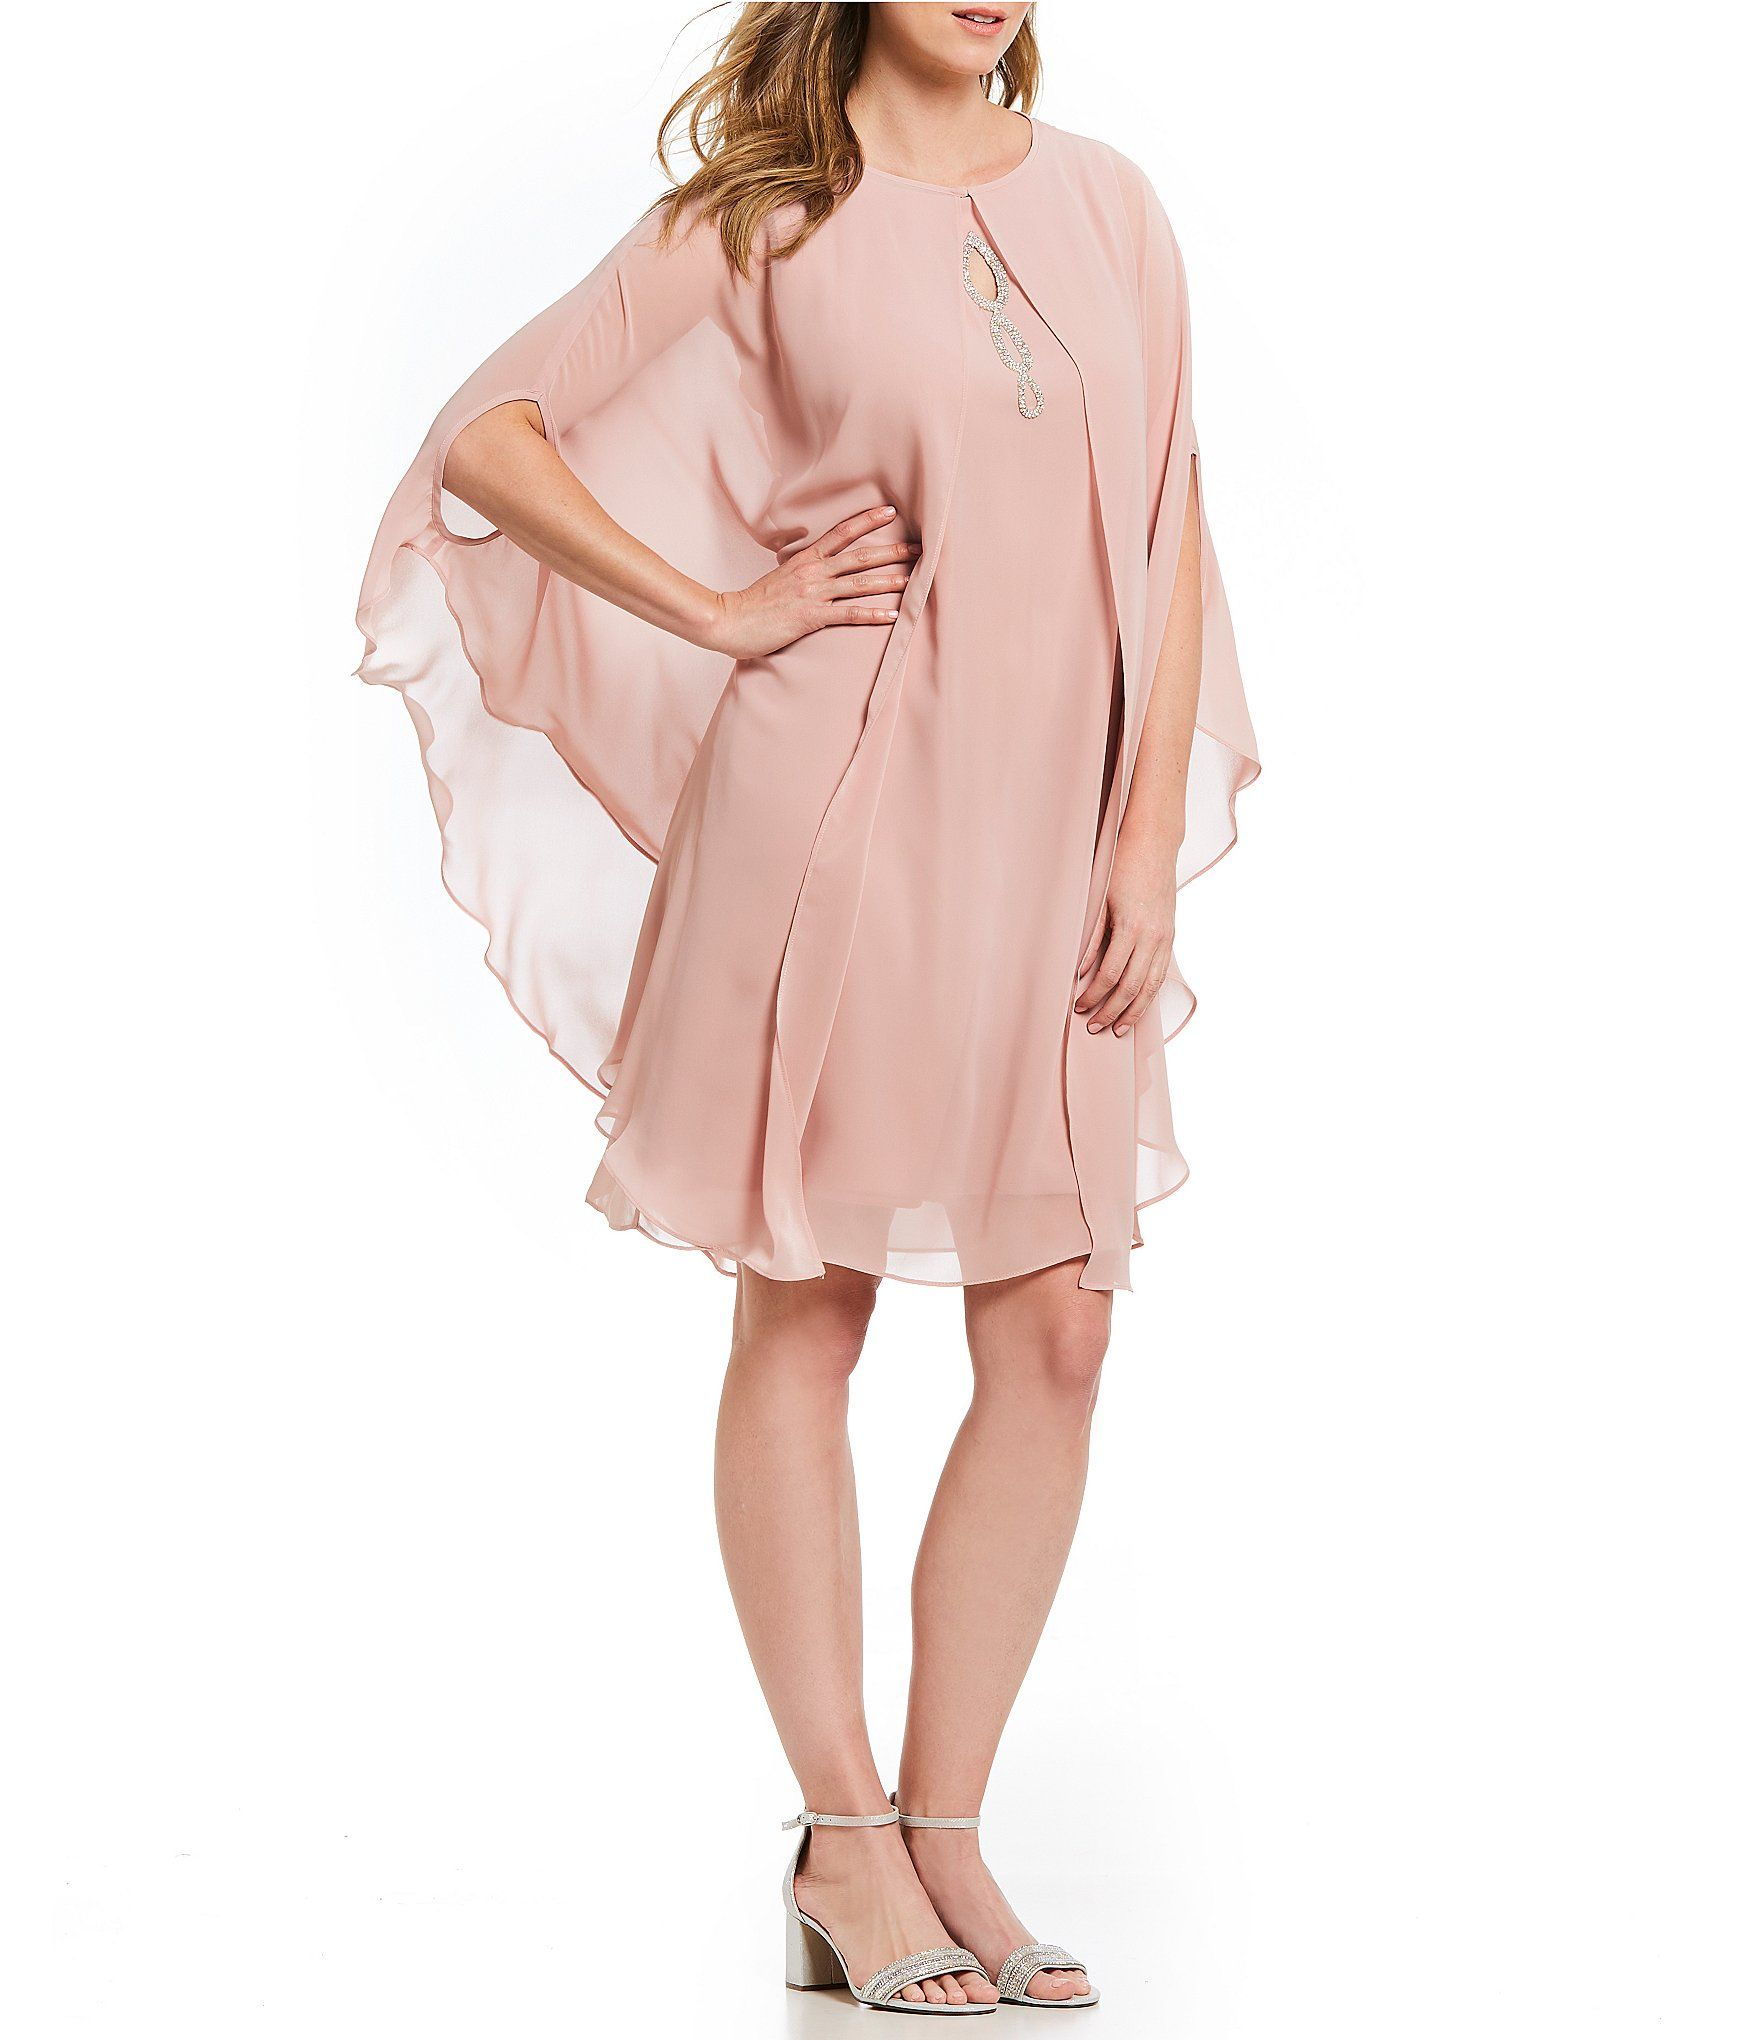 7a42182128 Ignite Evenings Beaded Capelet Dress  Dillards